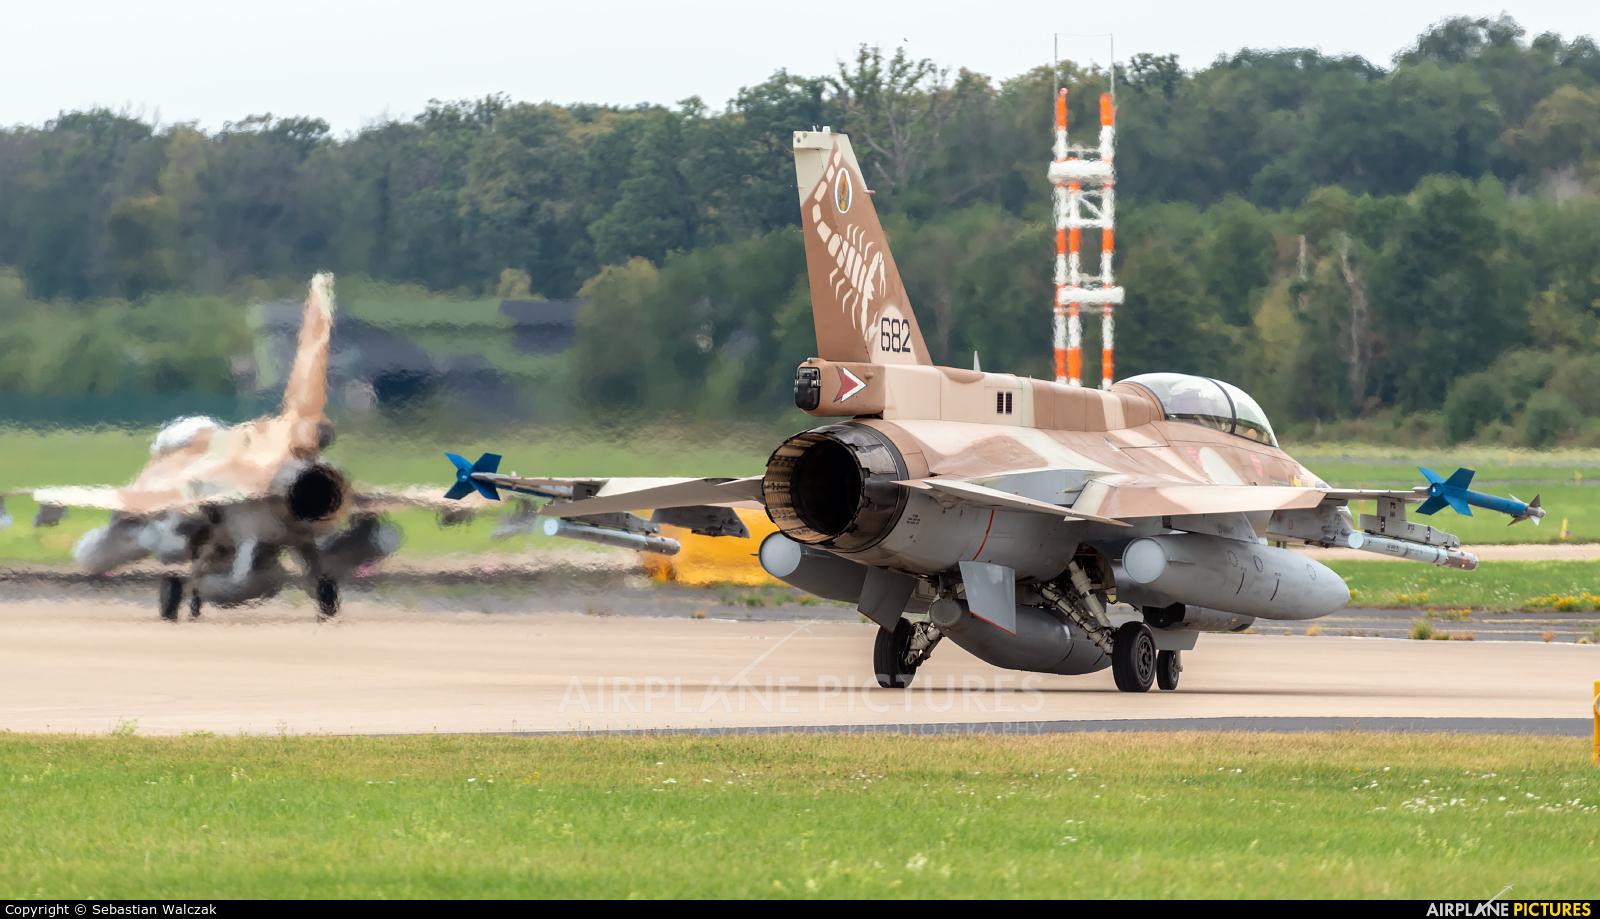 Israel - Defence Force 682 aircraft at Nörvenich